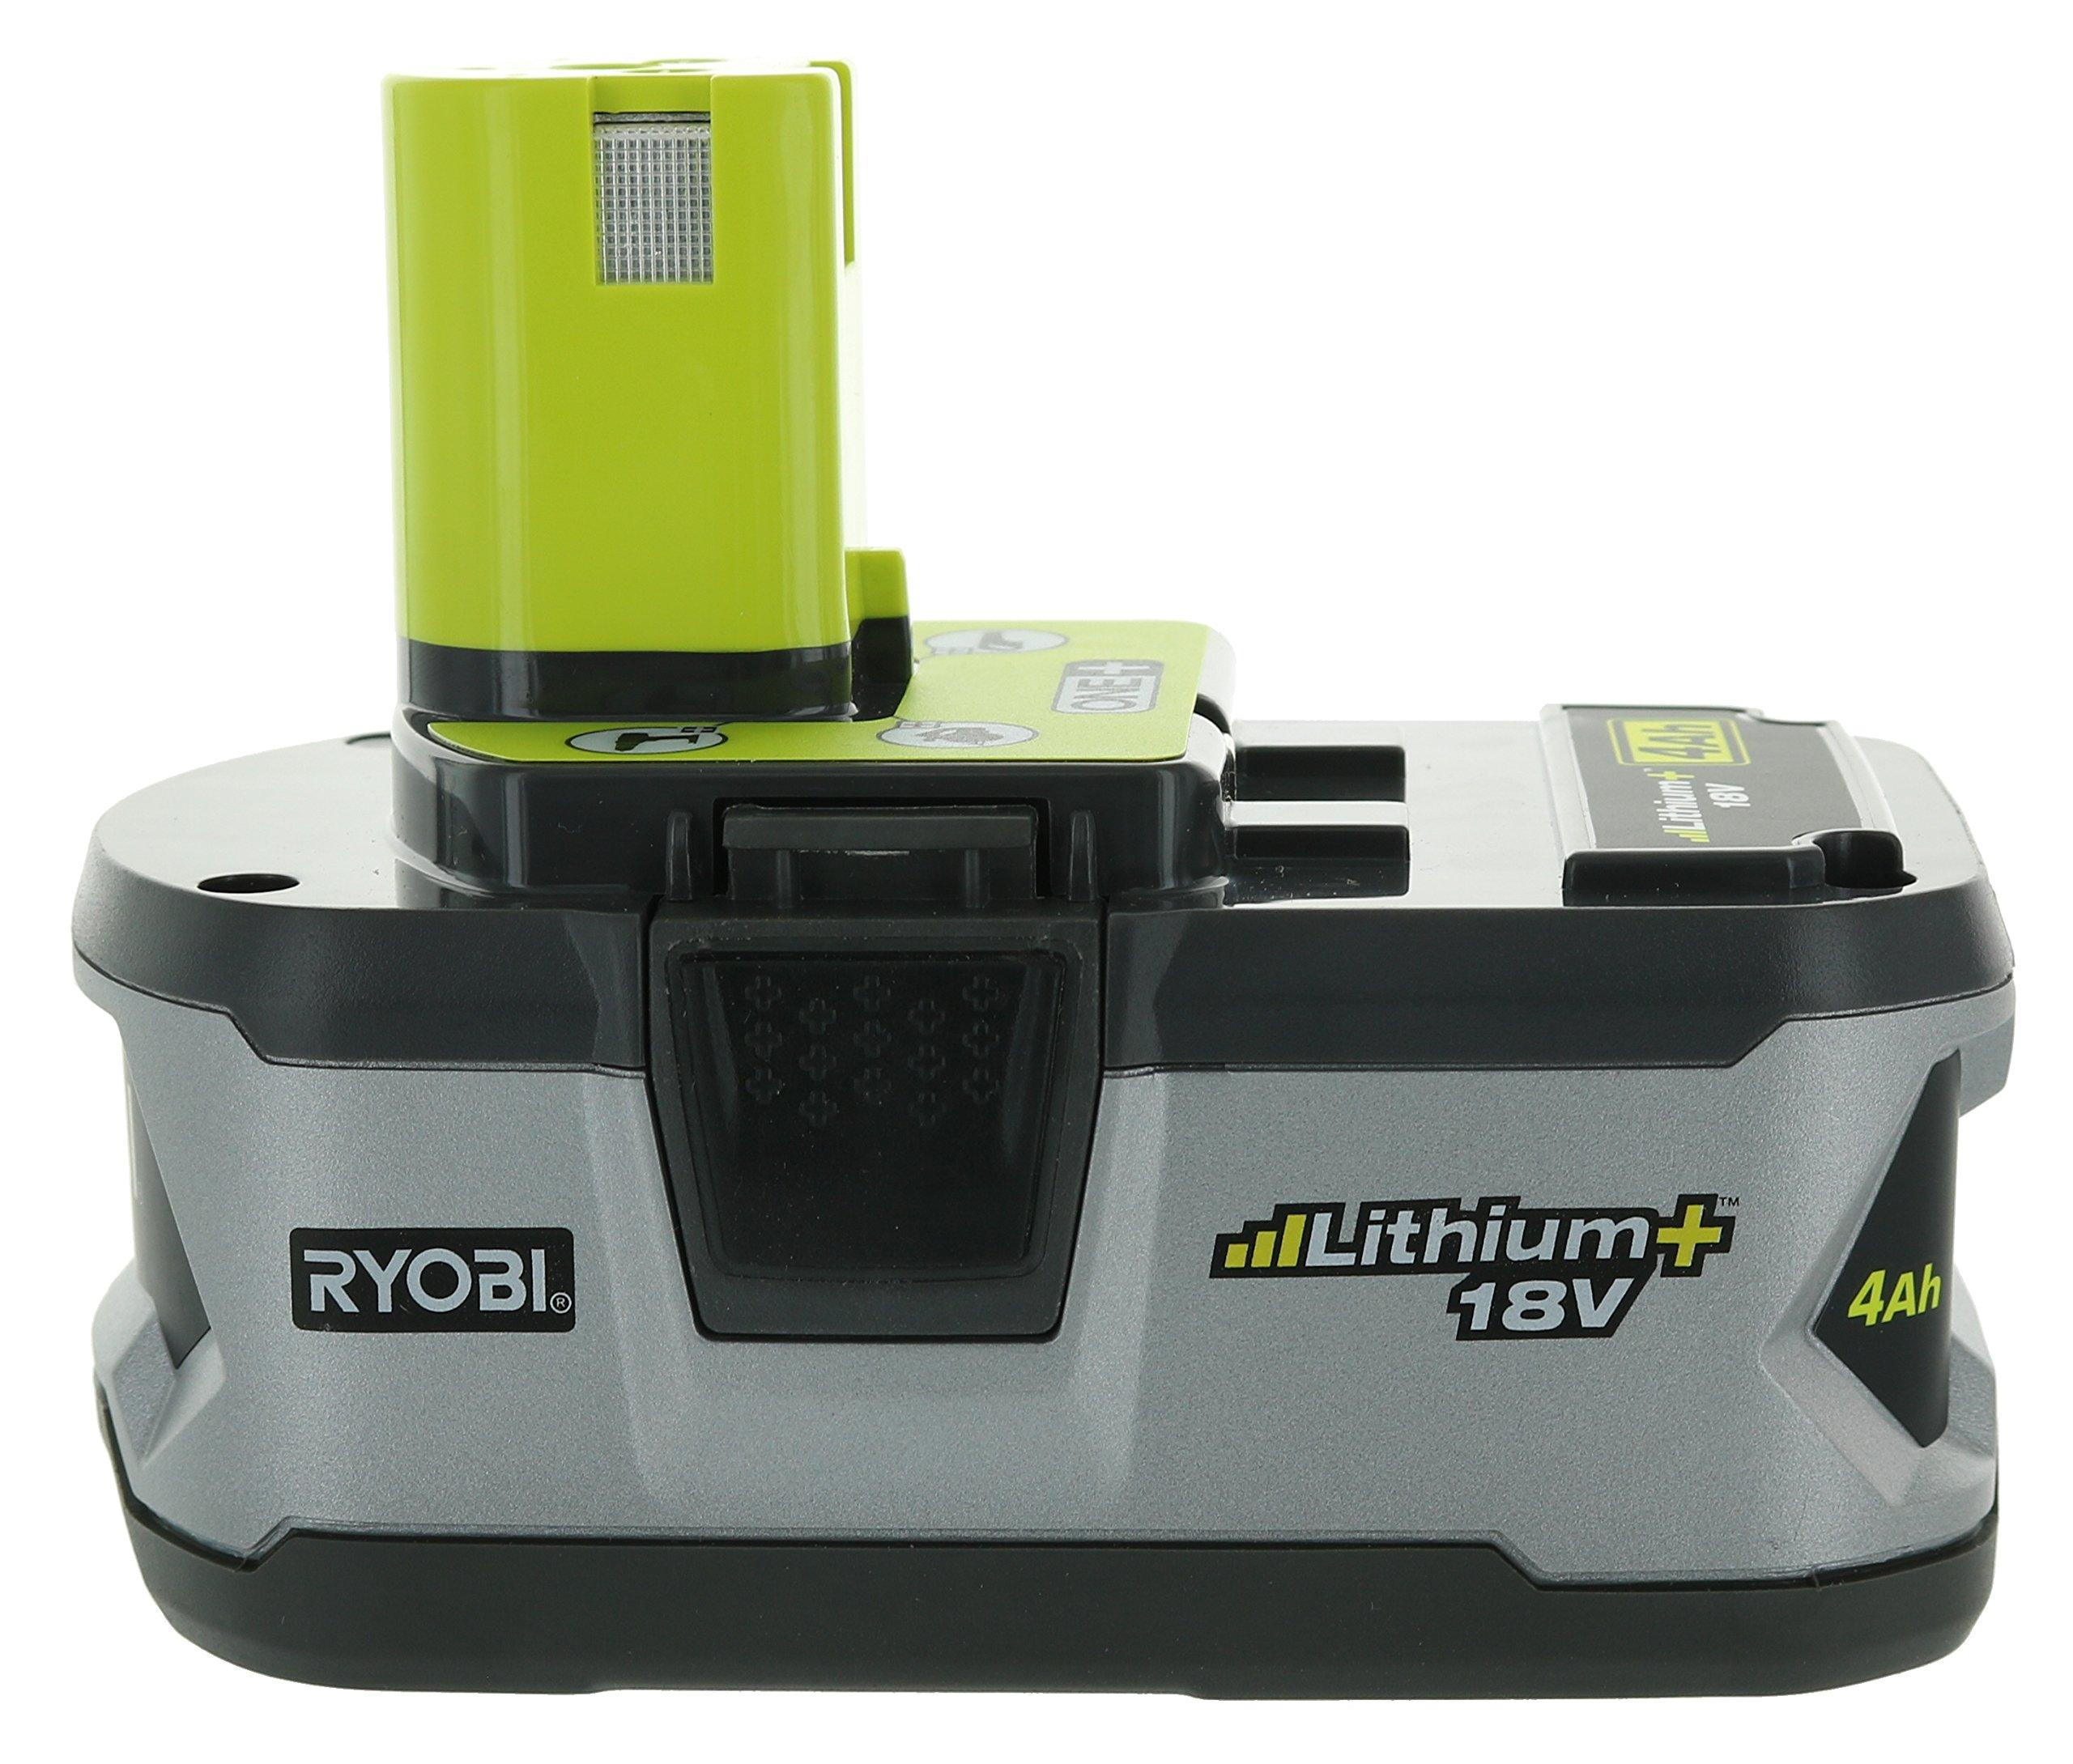 Ryobi P122 4AH One+ High Capacity Lithium Ion Batteries For Ryobi Power Tools (2 Pack of P108 Batteries) by Ryobi (Image #4)